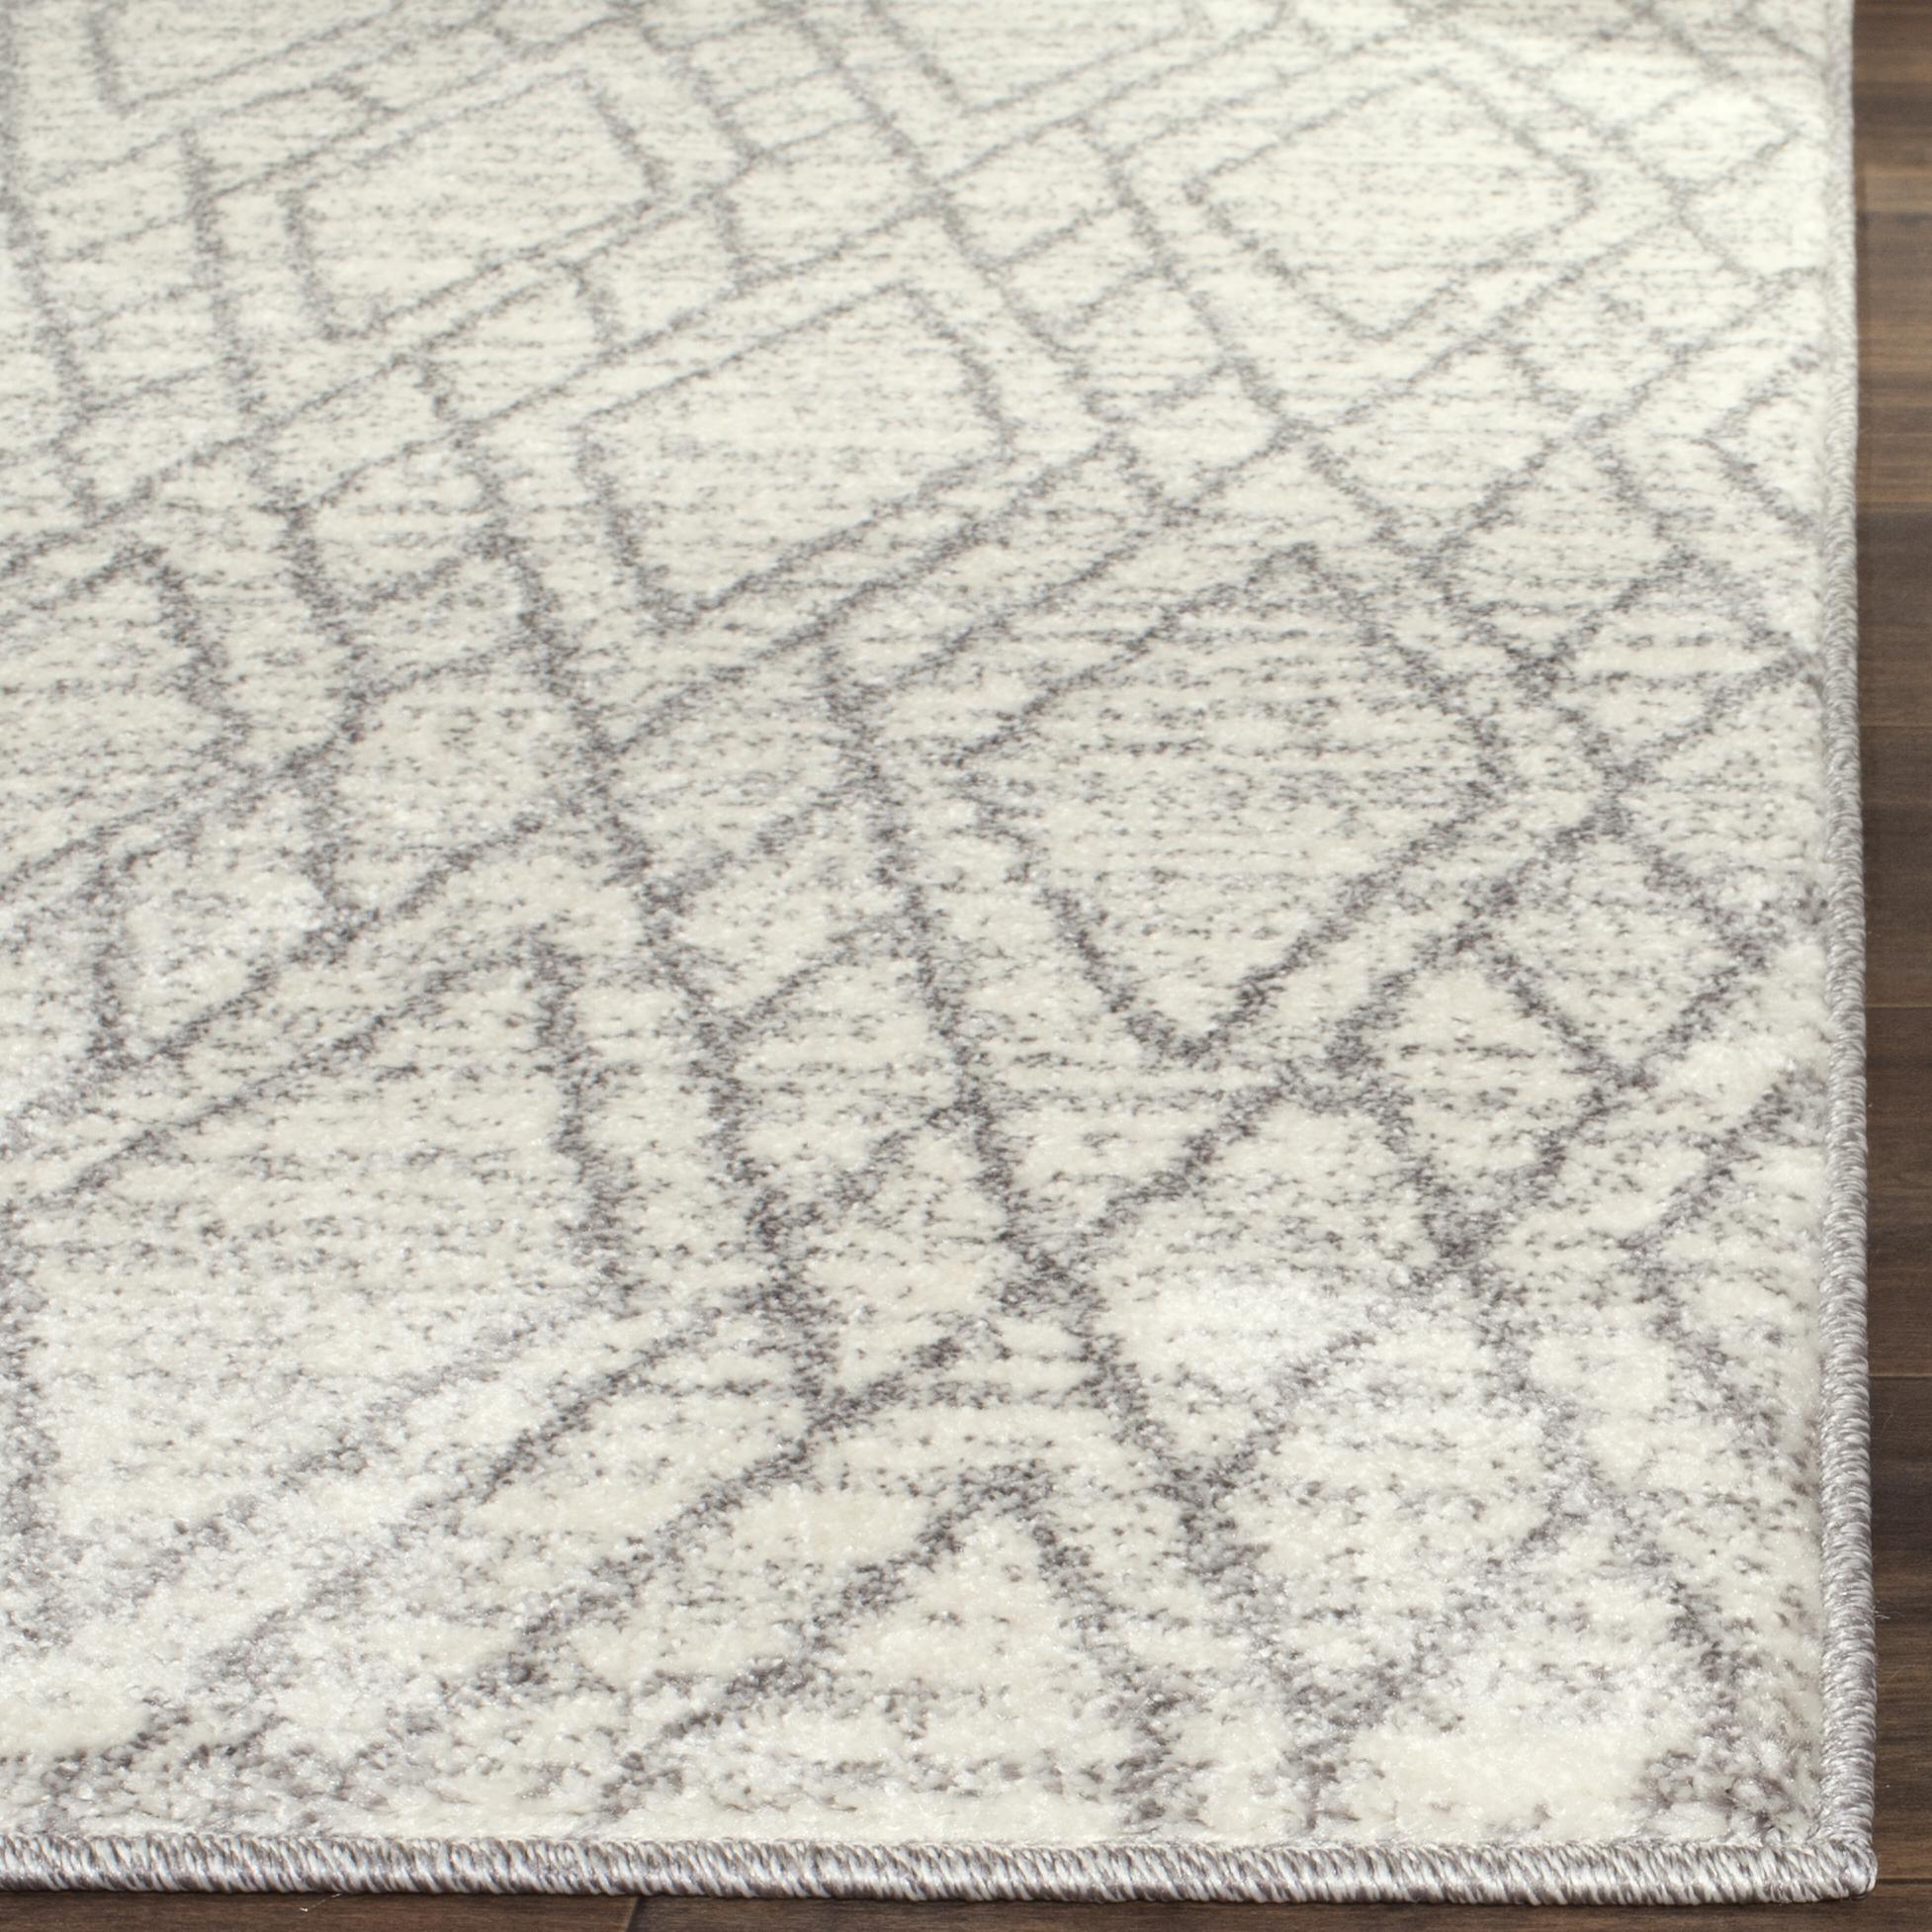 "Woven Area Rug, Ivory & Light Gray, 6' 7"" x 9' 2"""